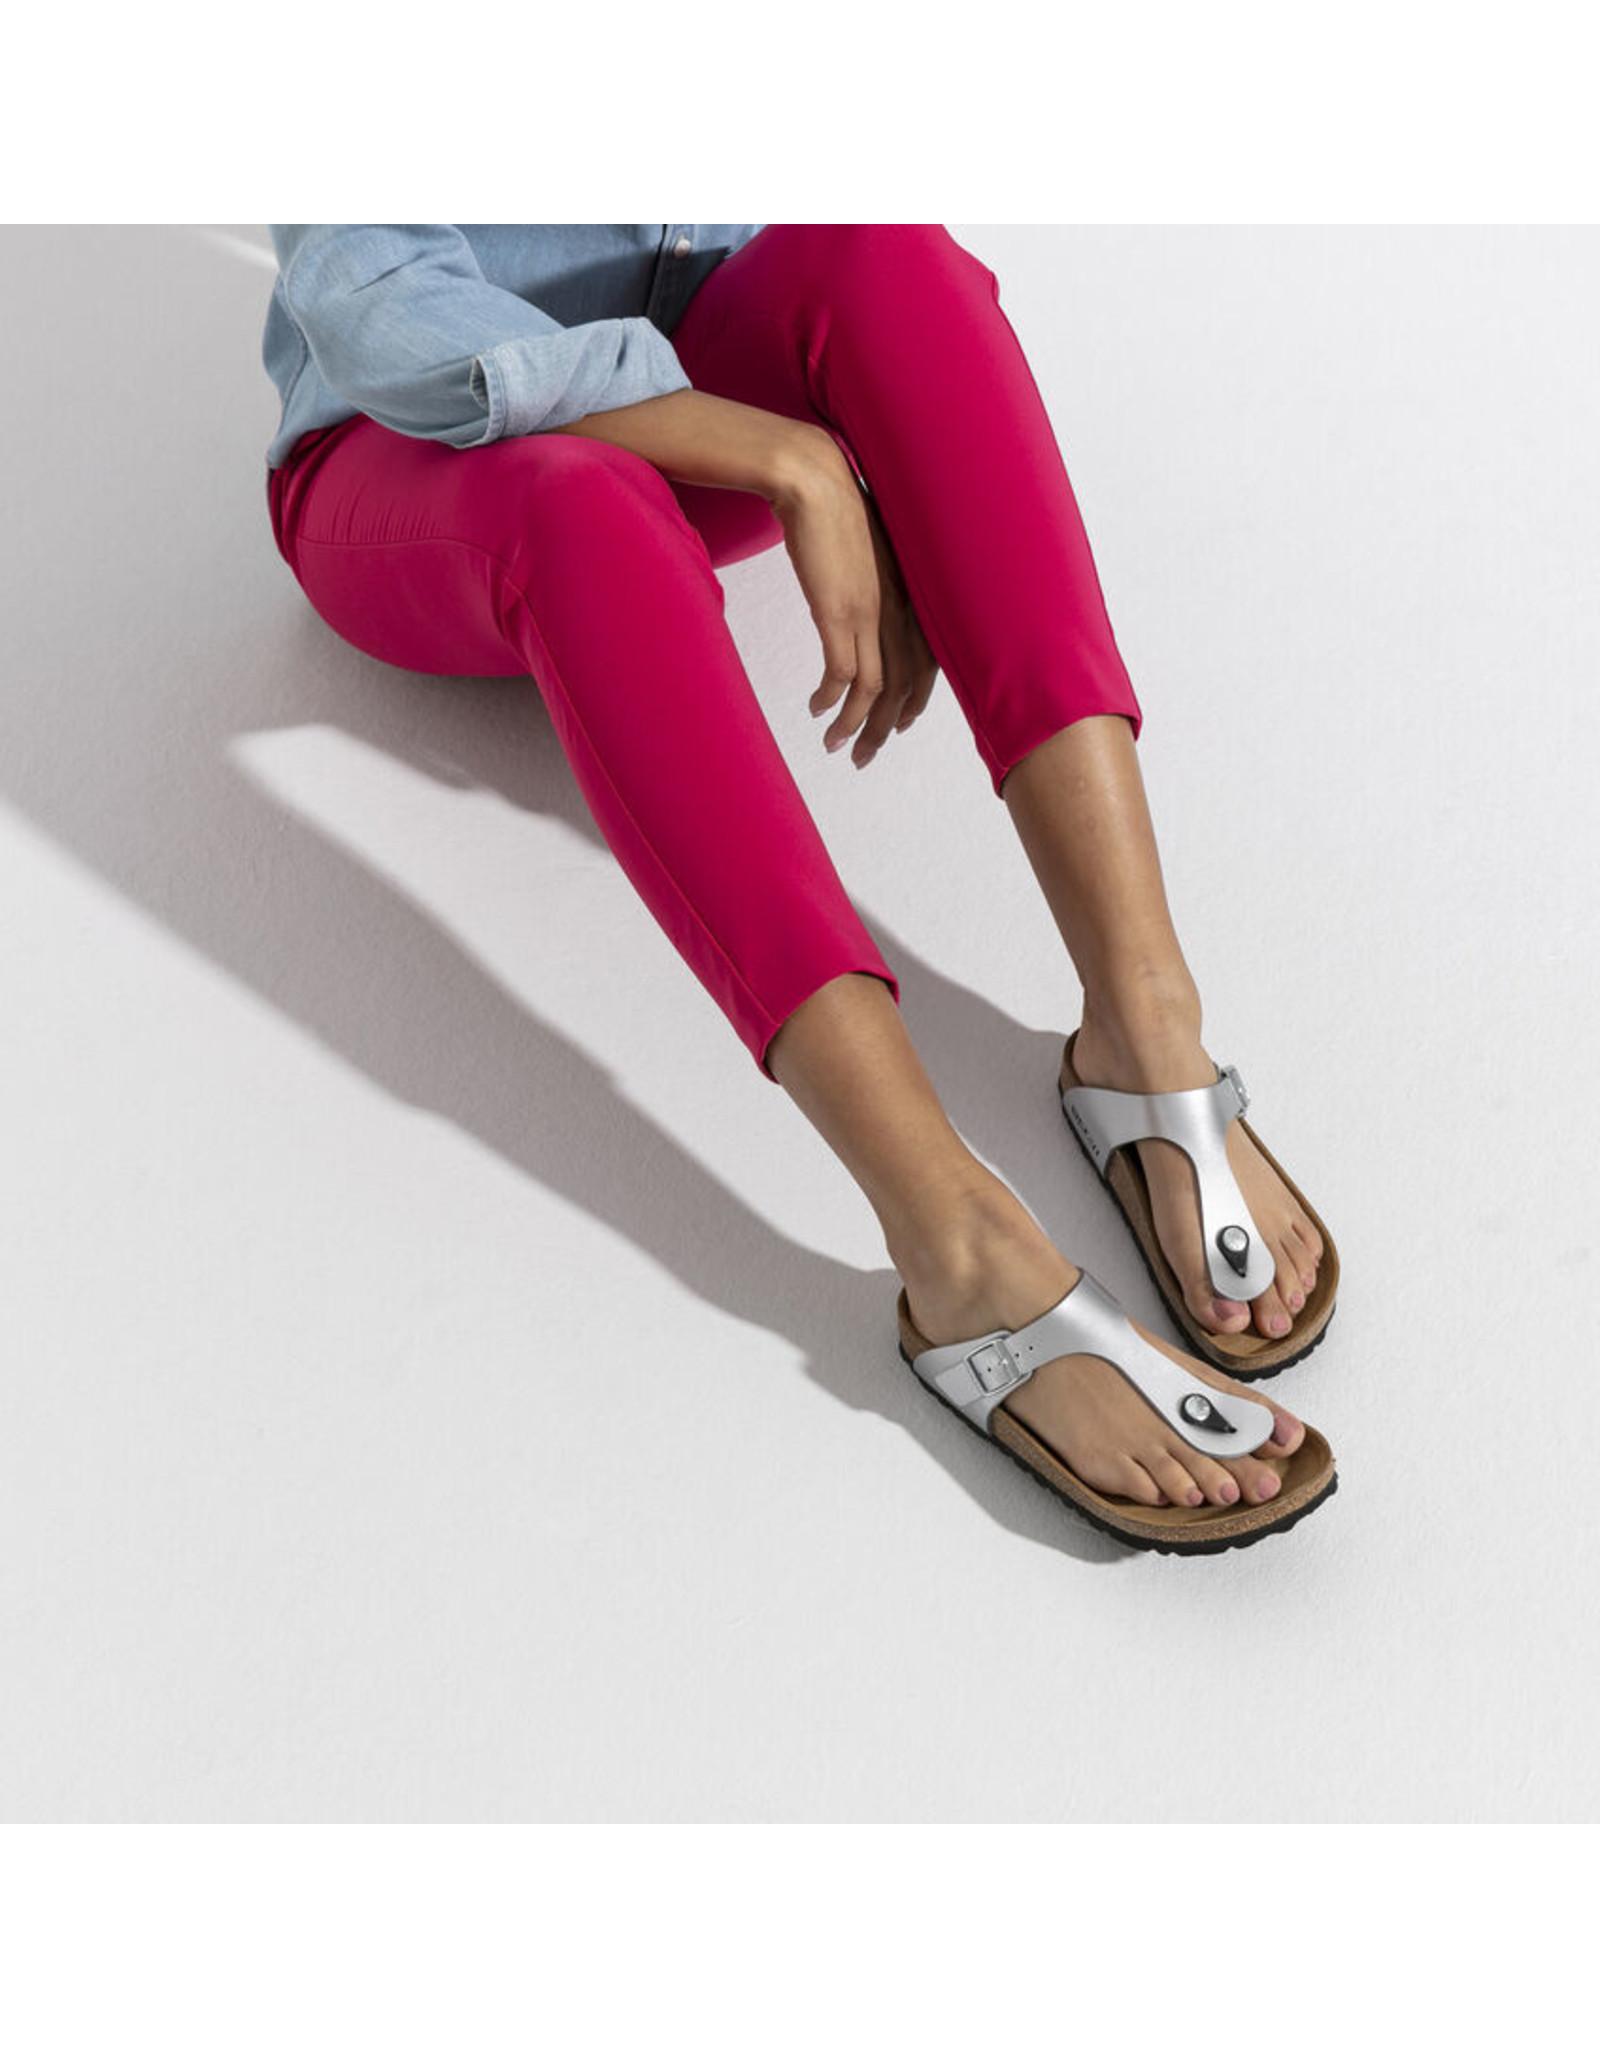 Birkenstock Gizeh Sandal Birko-Flor